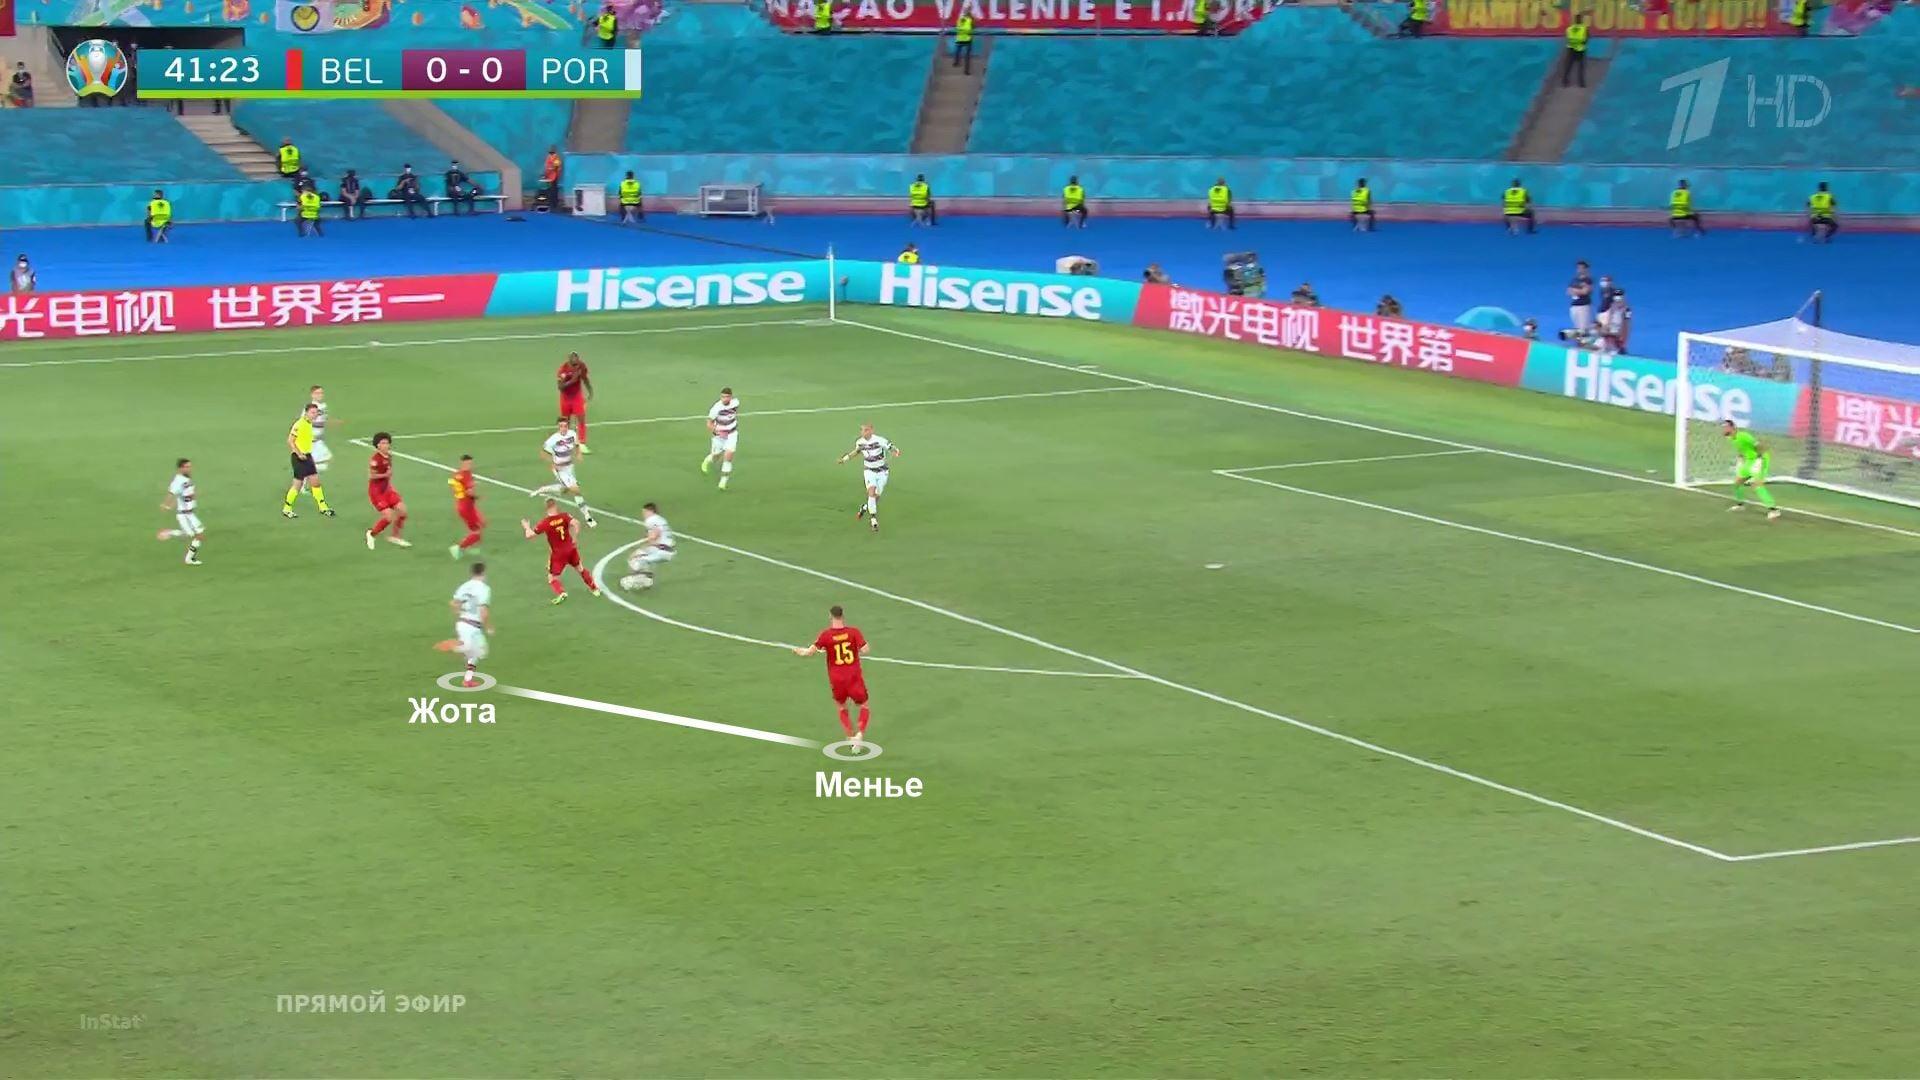 Бельгия закрылась против Португалии. До перерыва план работал, но во втором тайме удержались чисто на фарте